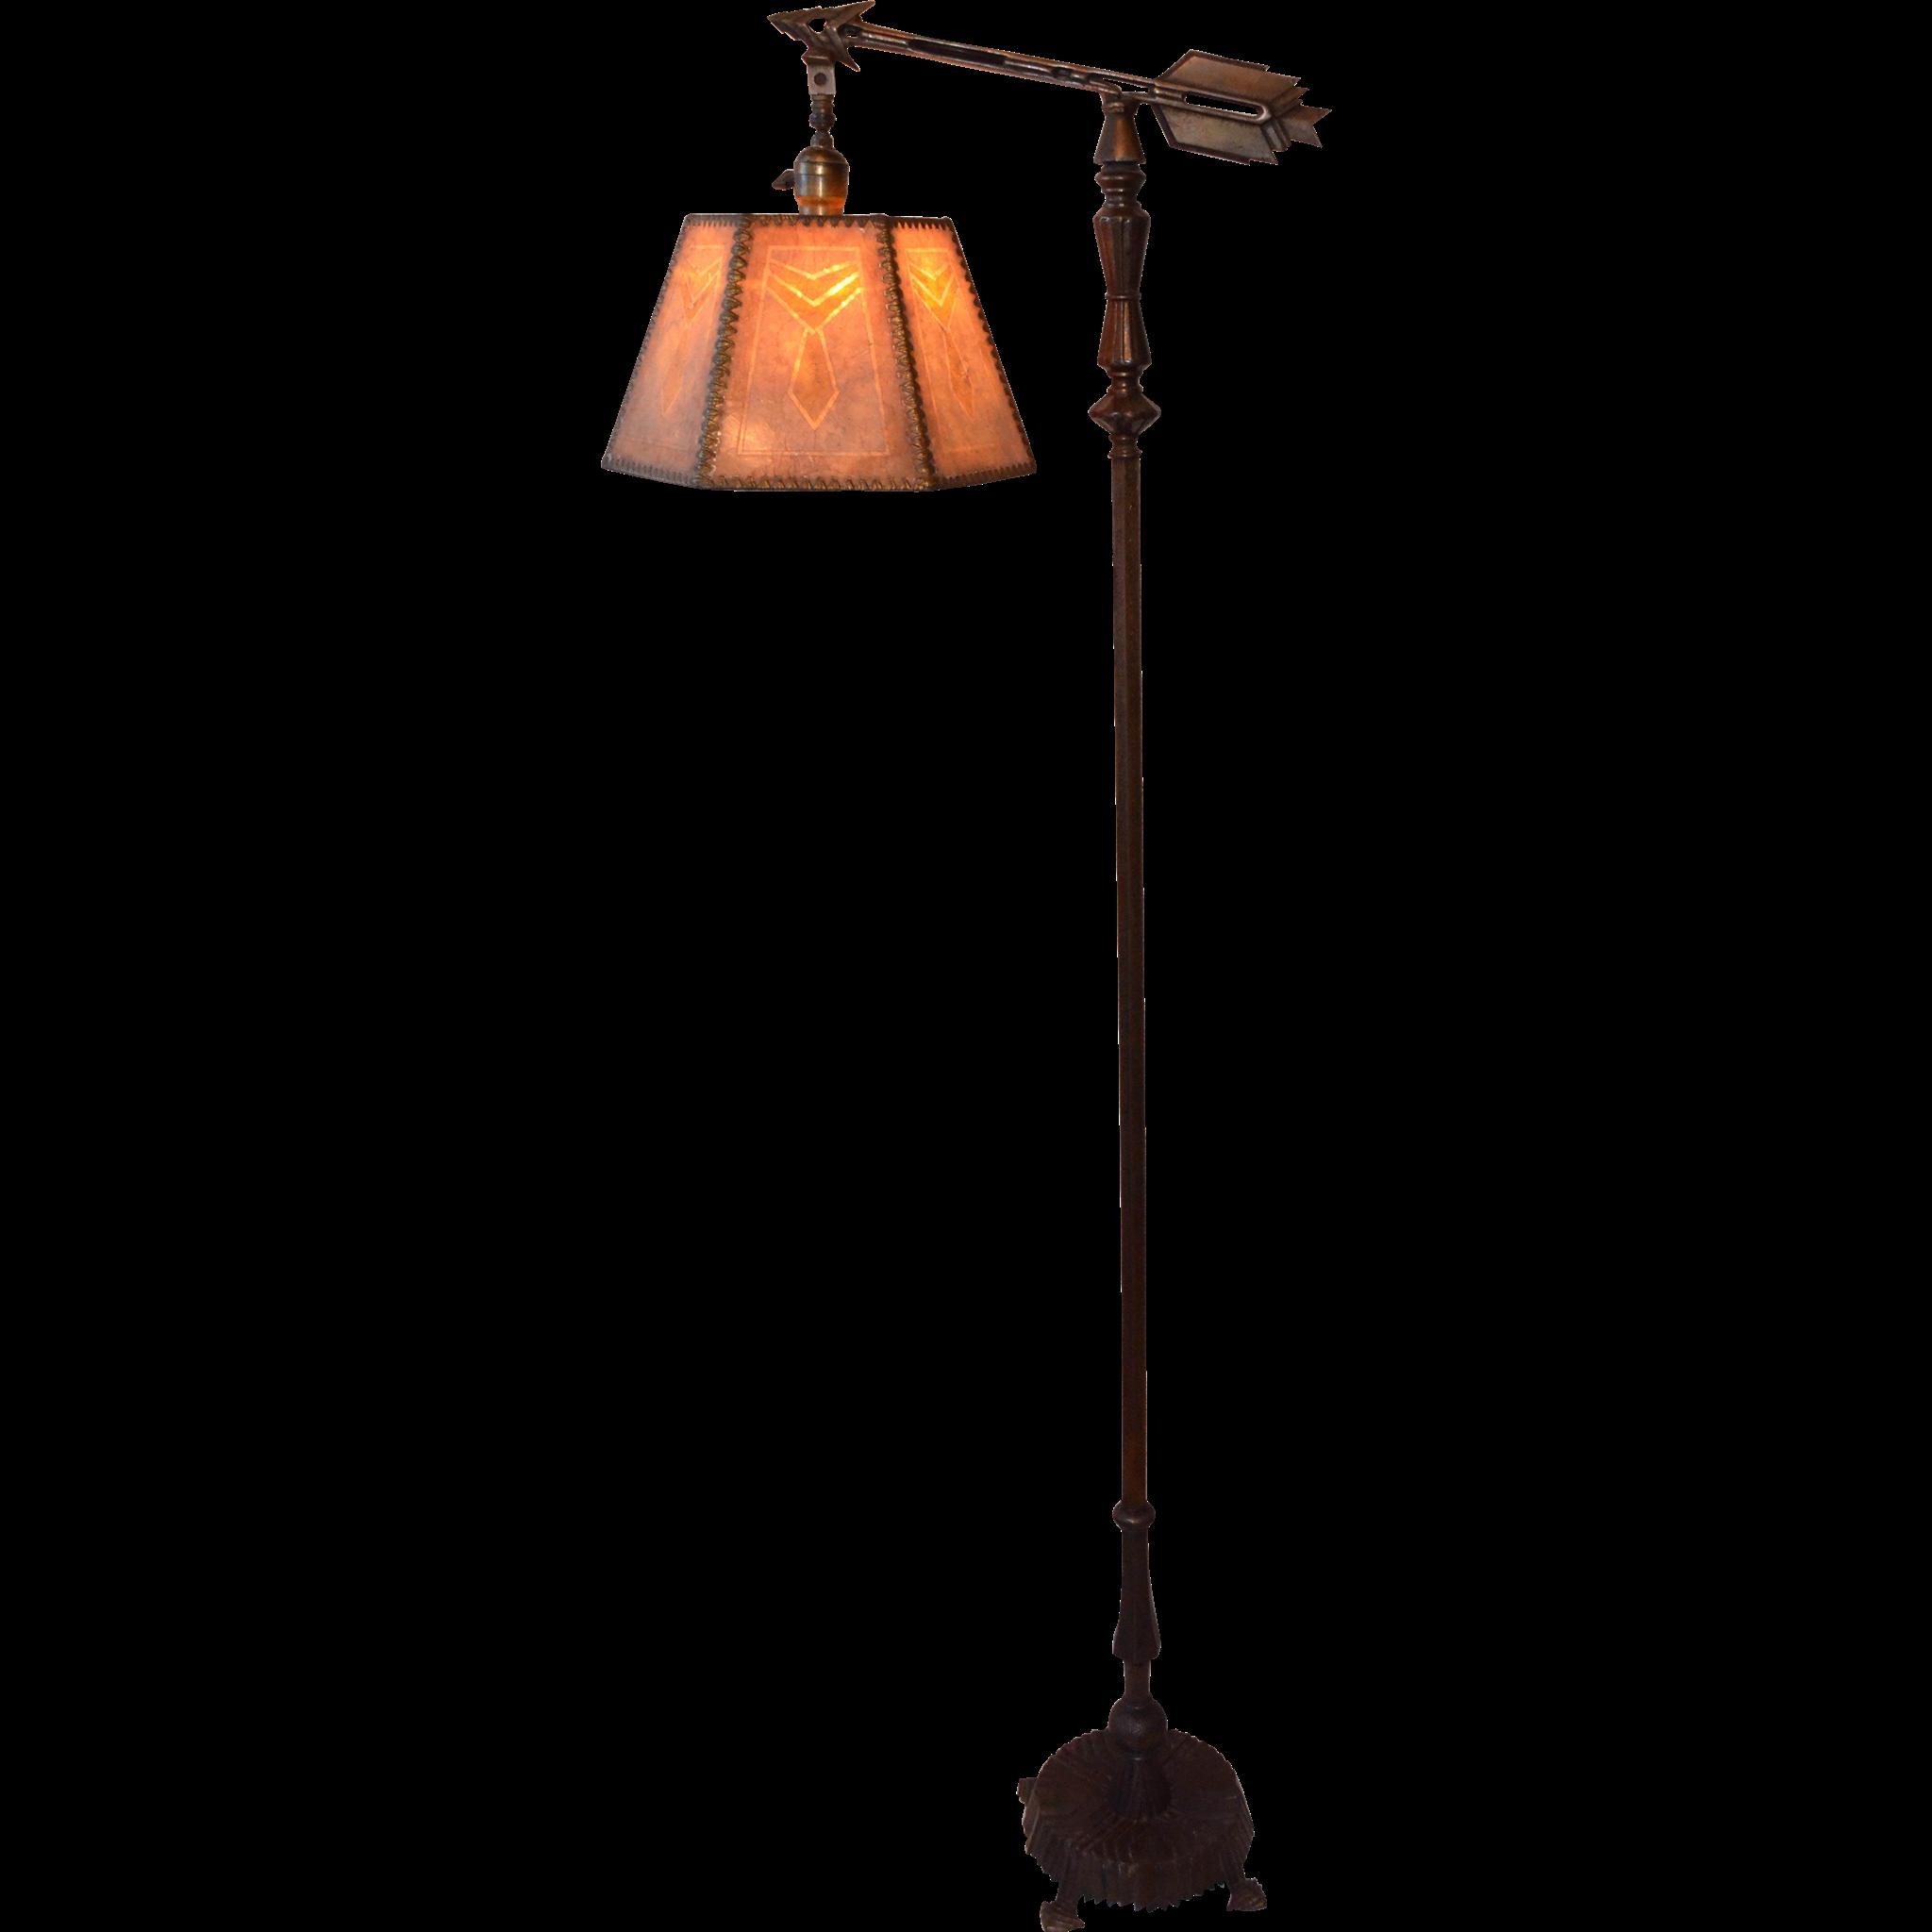 art deco bridge lamp with original mica shade Rob s lamps